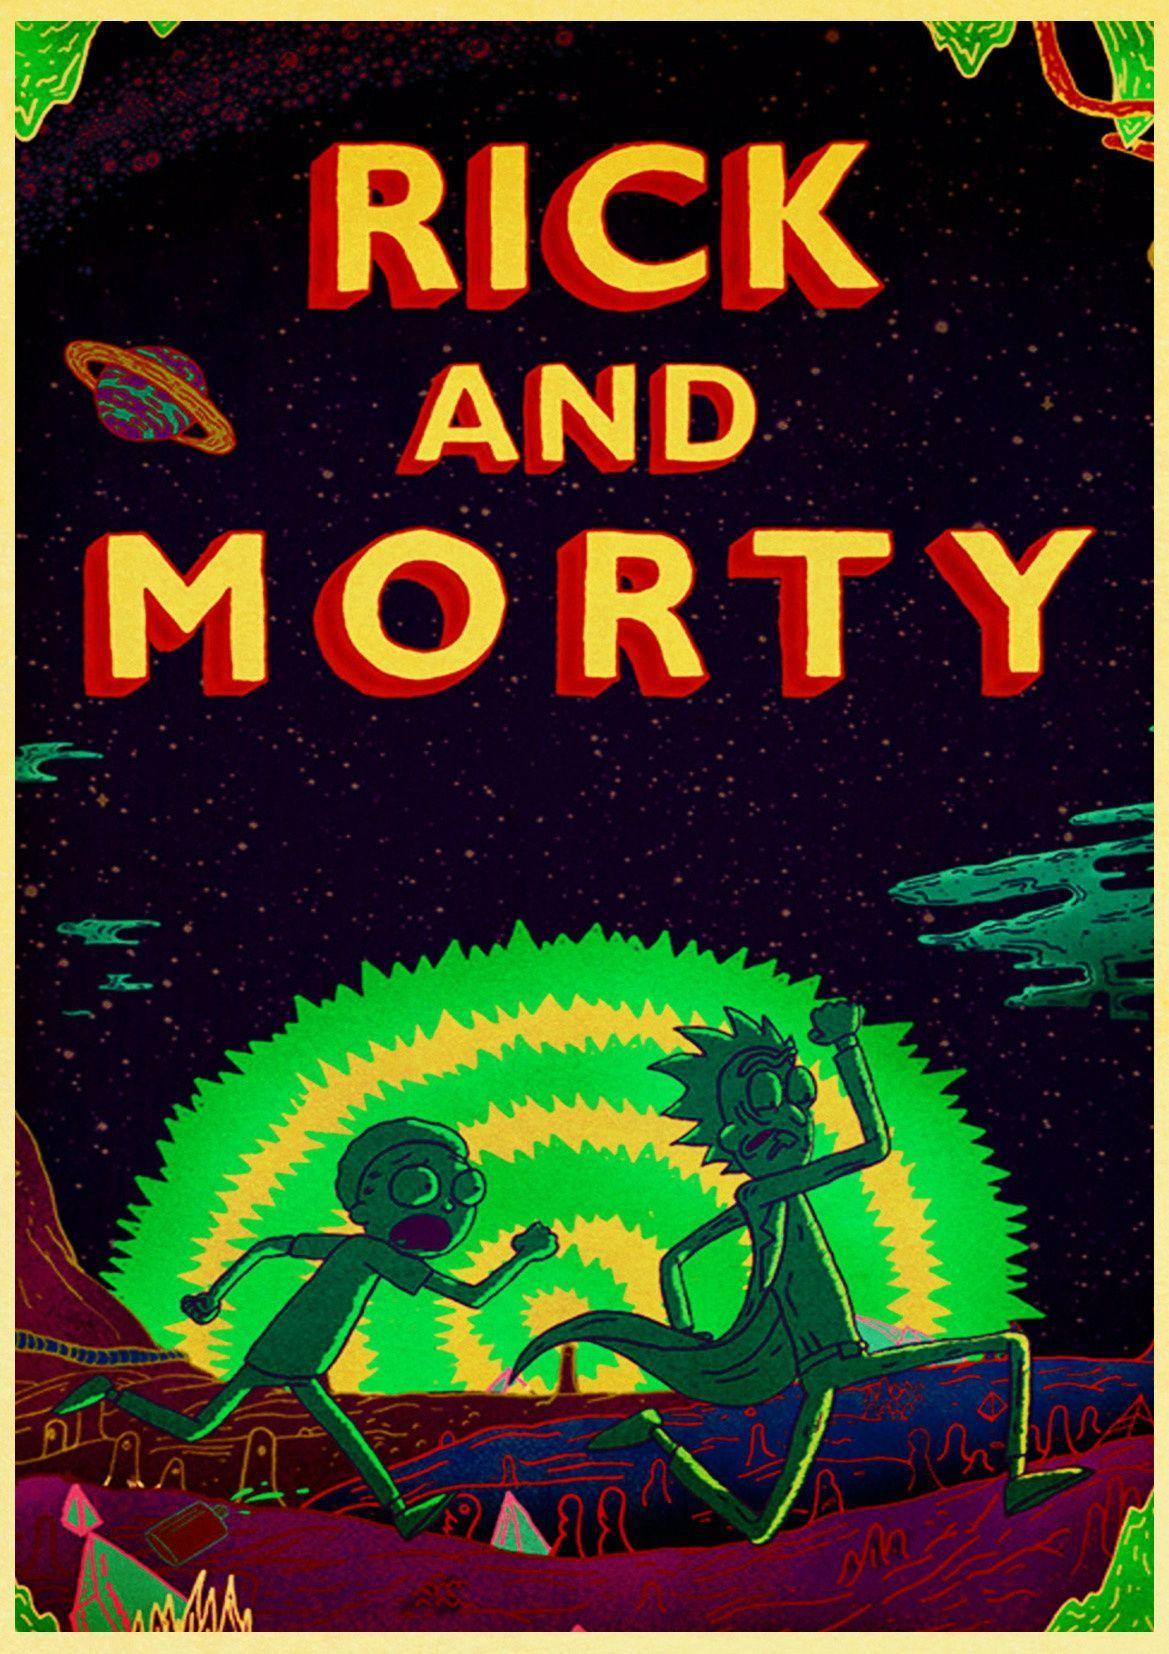 31] Retro Rick And Morty Wallpapers on WallpaperSafari 1169x1654